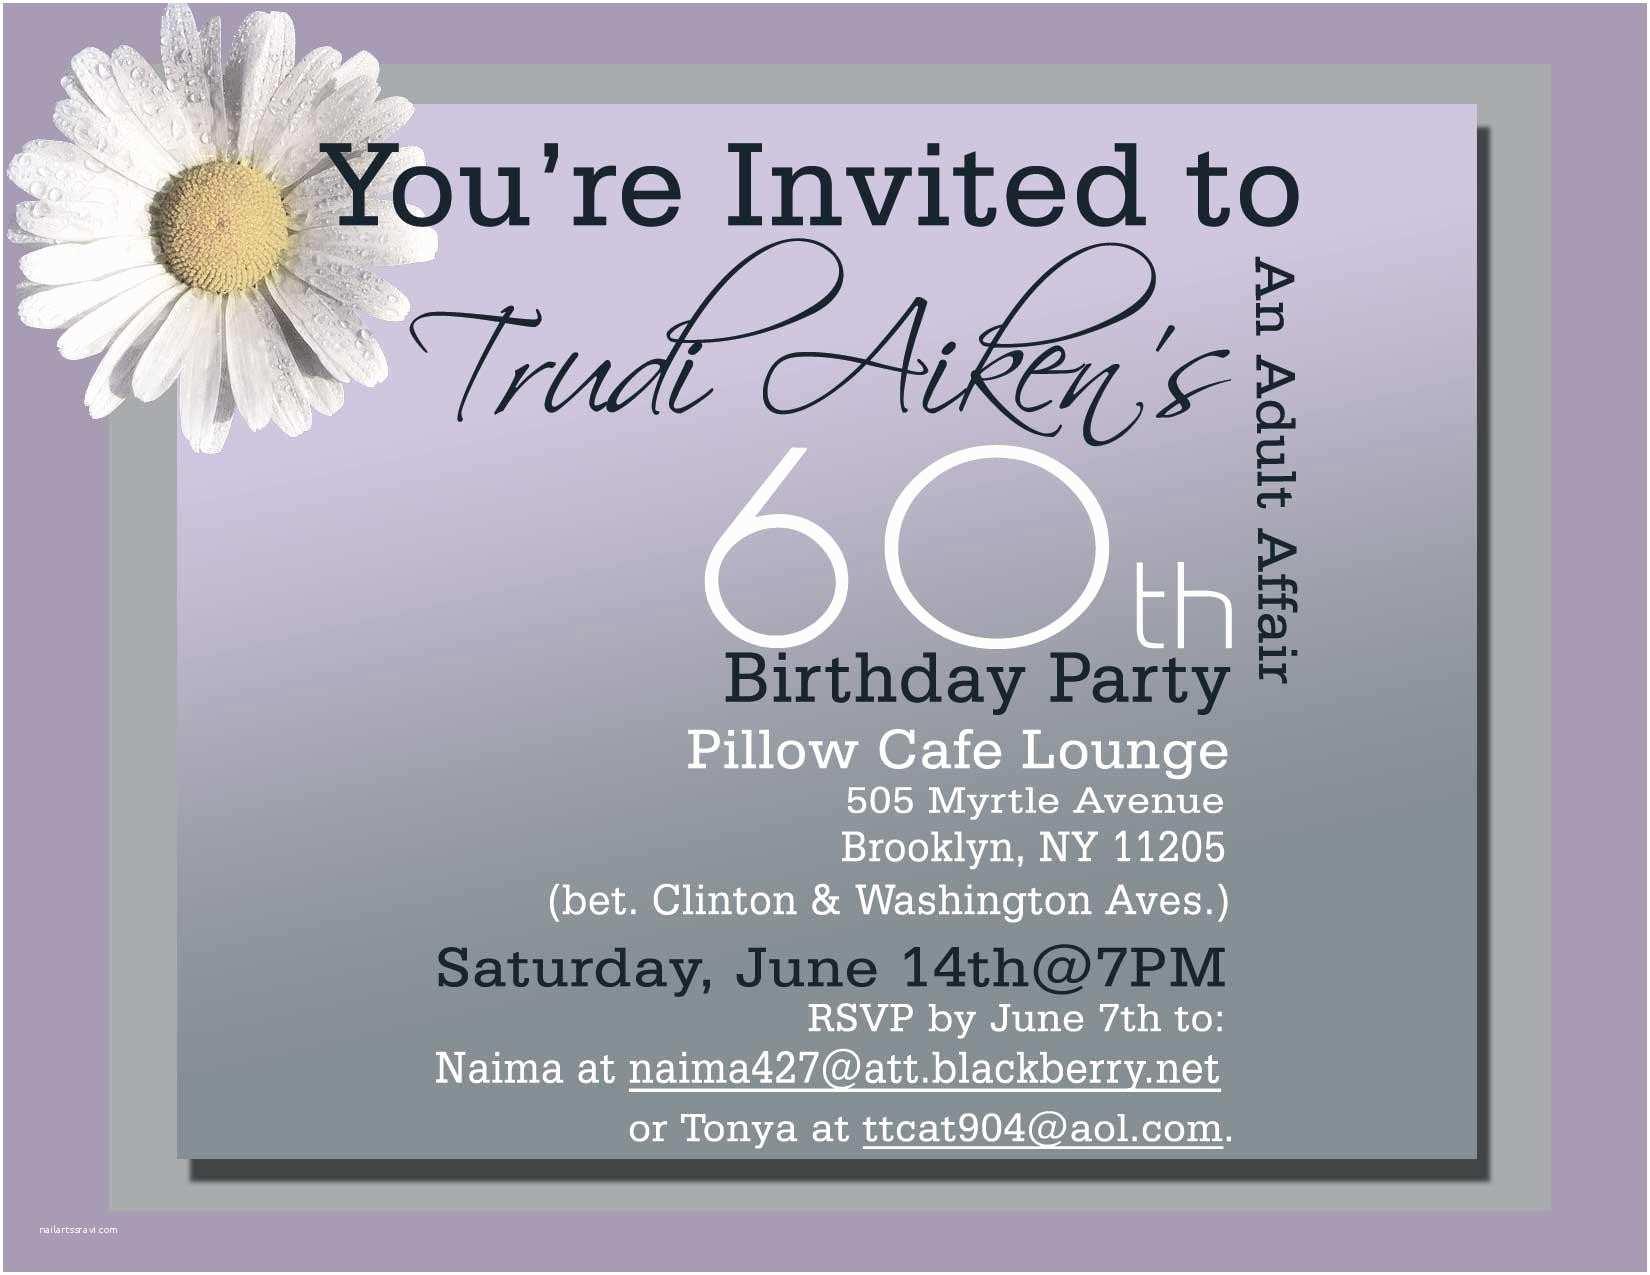 60th Birthday Invitation Wording Sample Invitation Wording for 60th Birthday